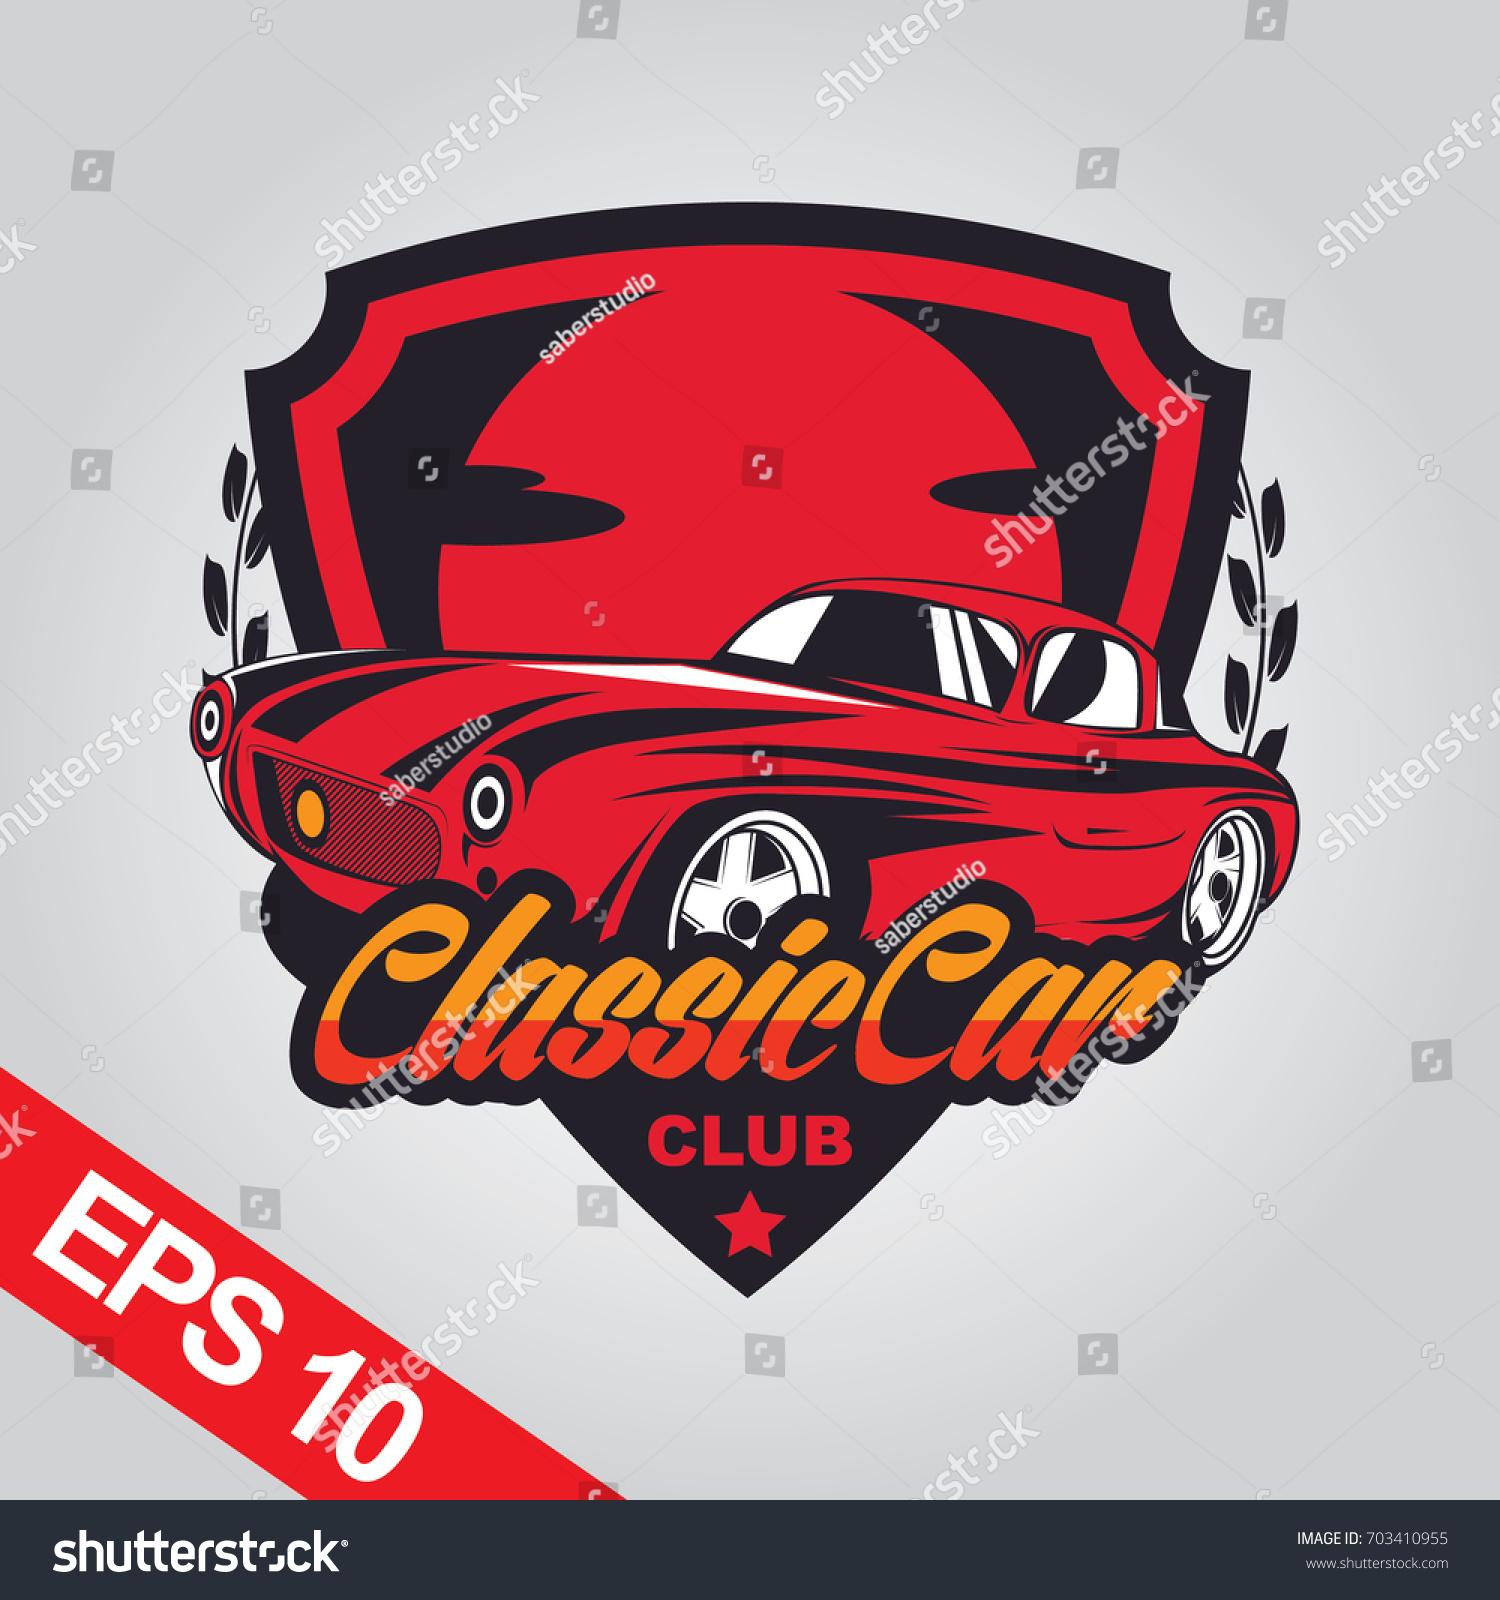 Classic Car Logo Template Vectores En Stock 703410955 - Shutterstock